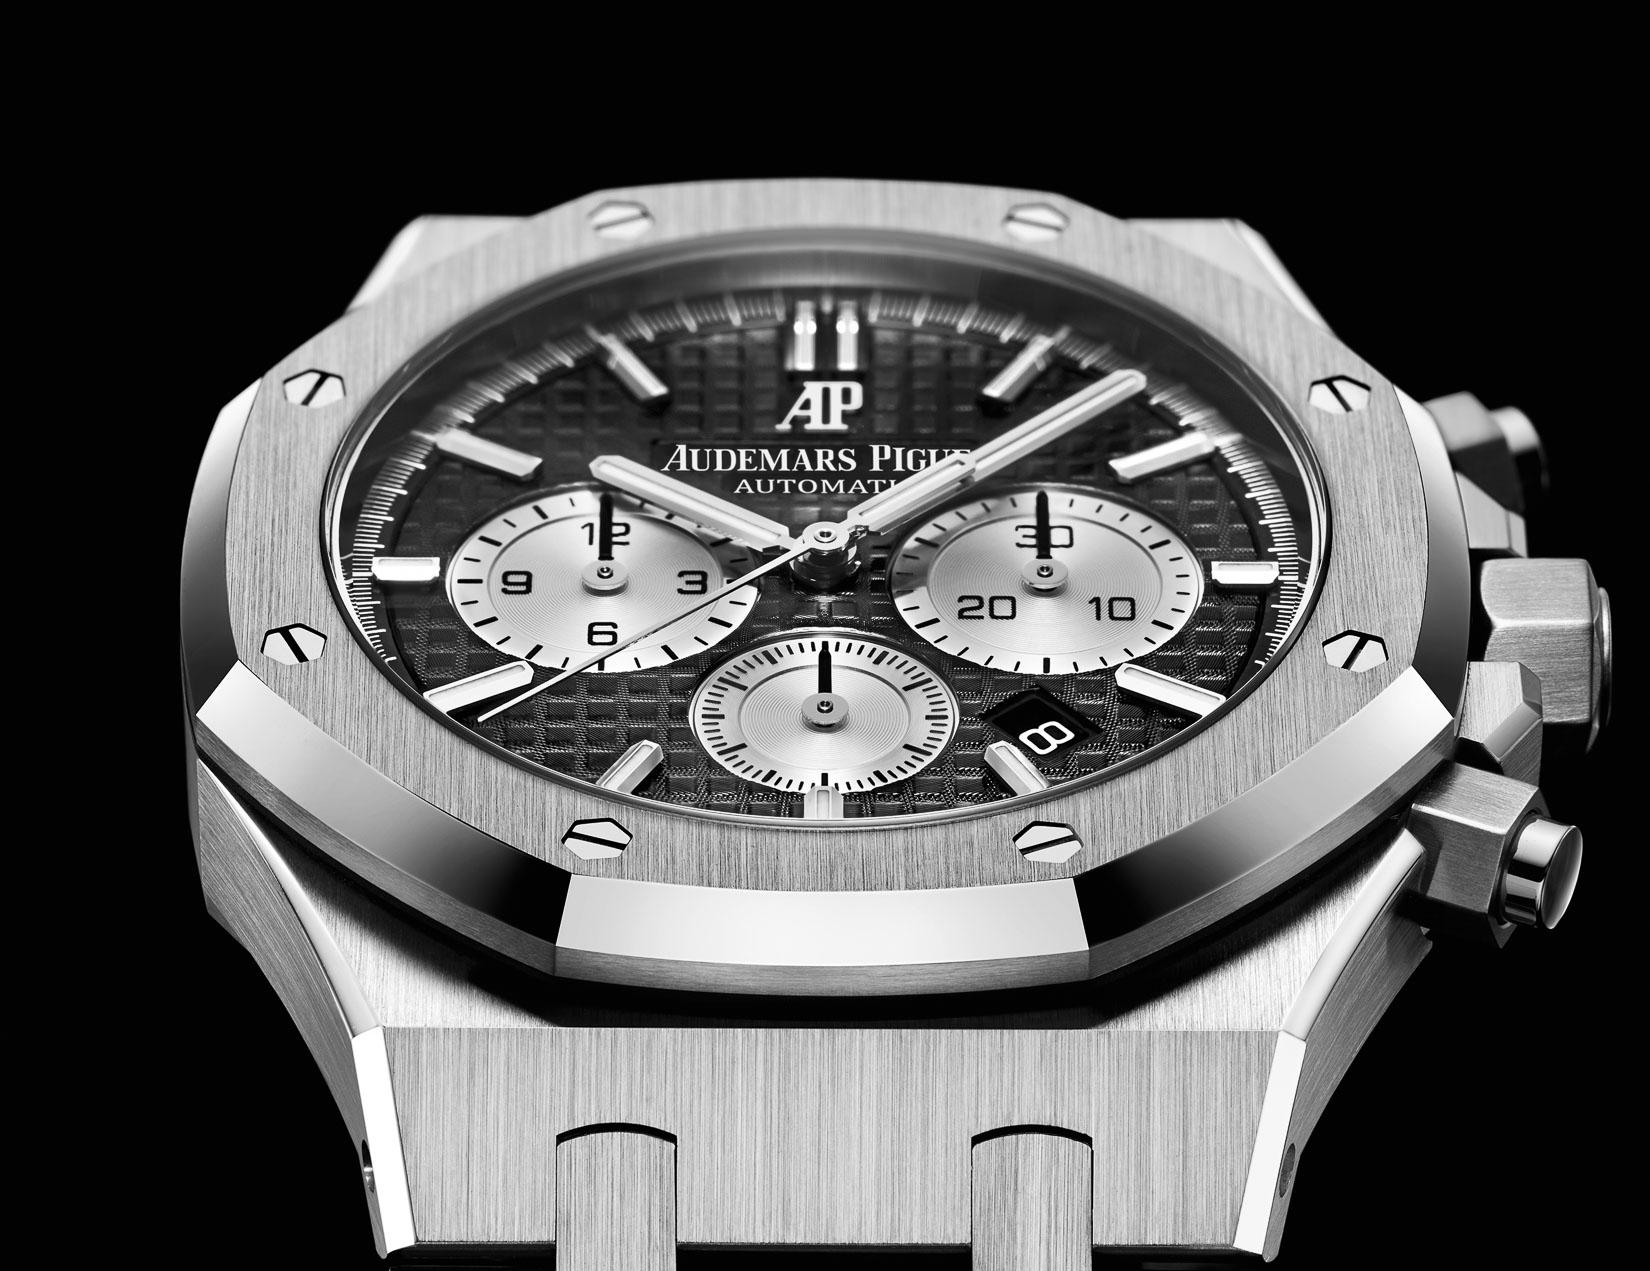 20 años de replicas relojes Audemars Piguet Royal Oak cronógrafo ... 60e1382f98a